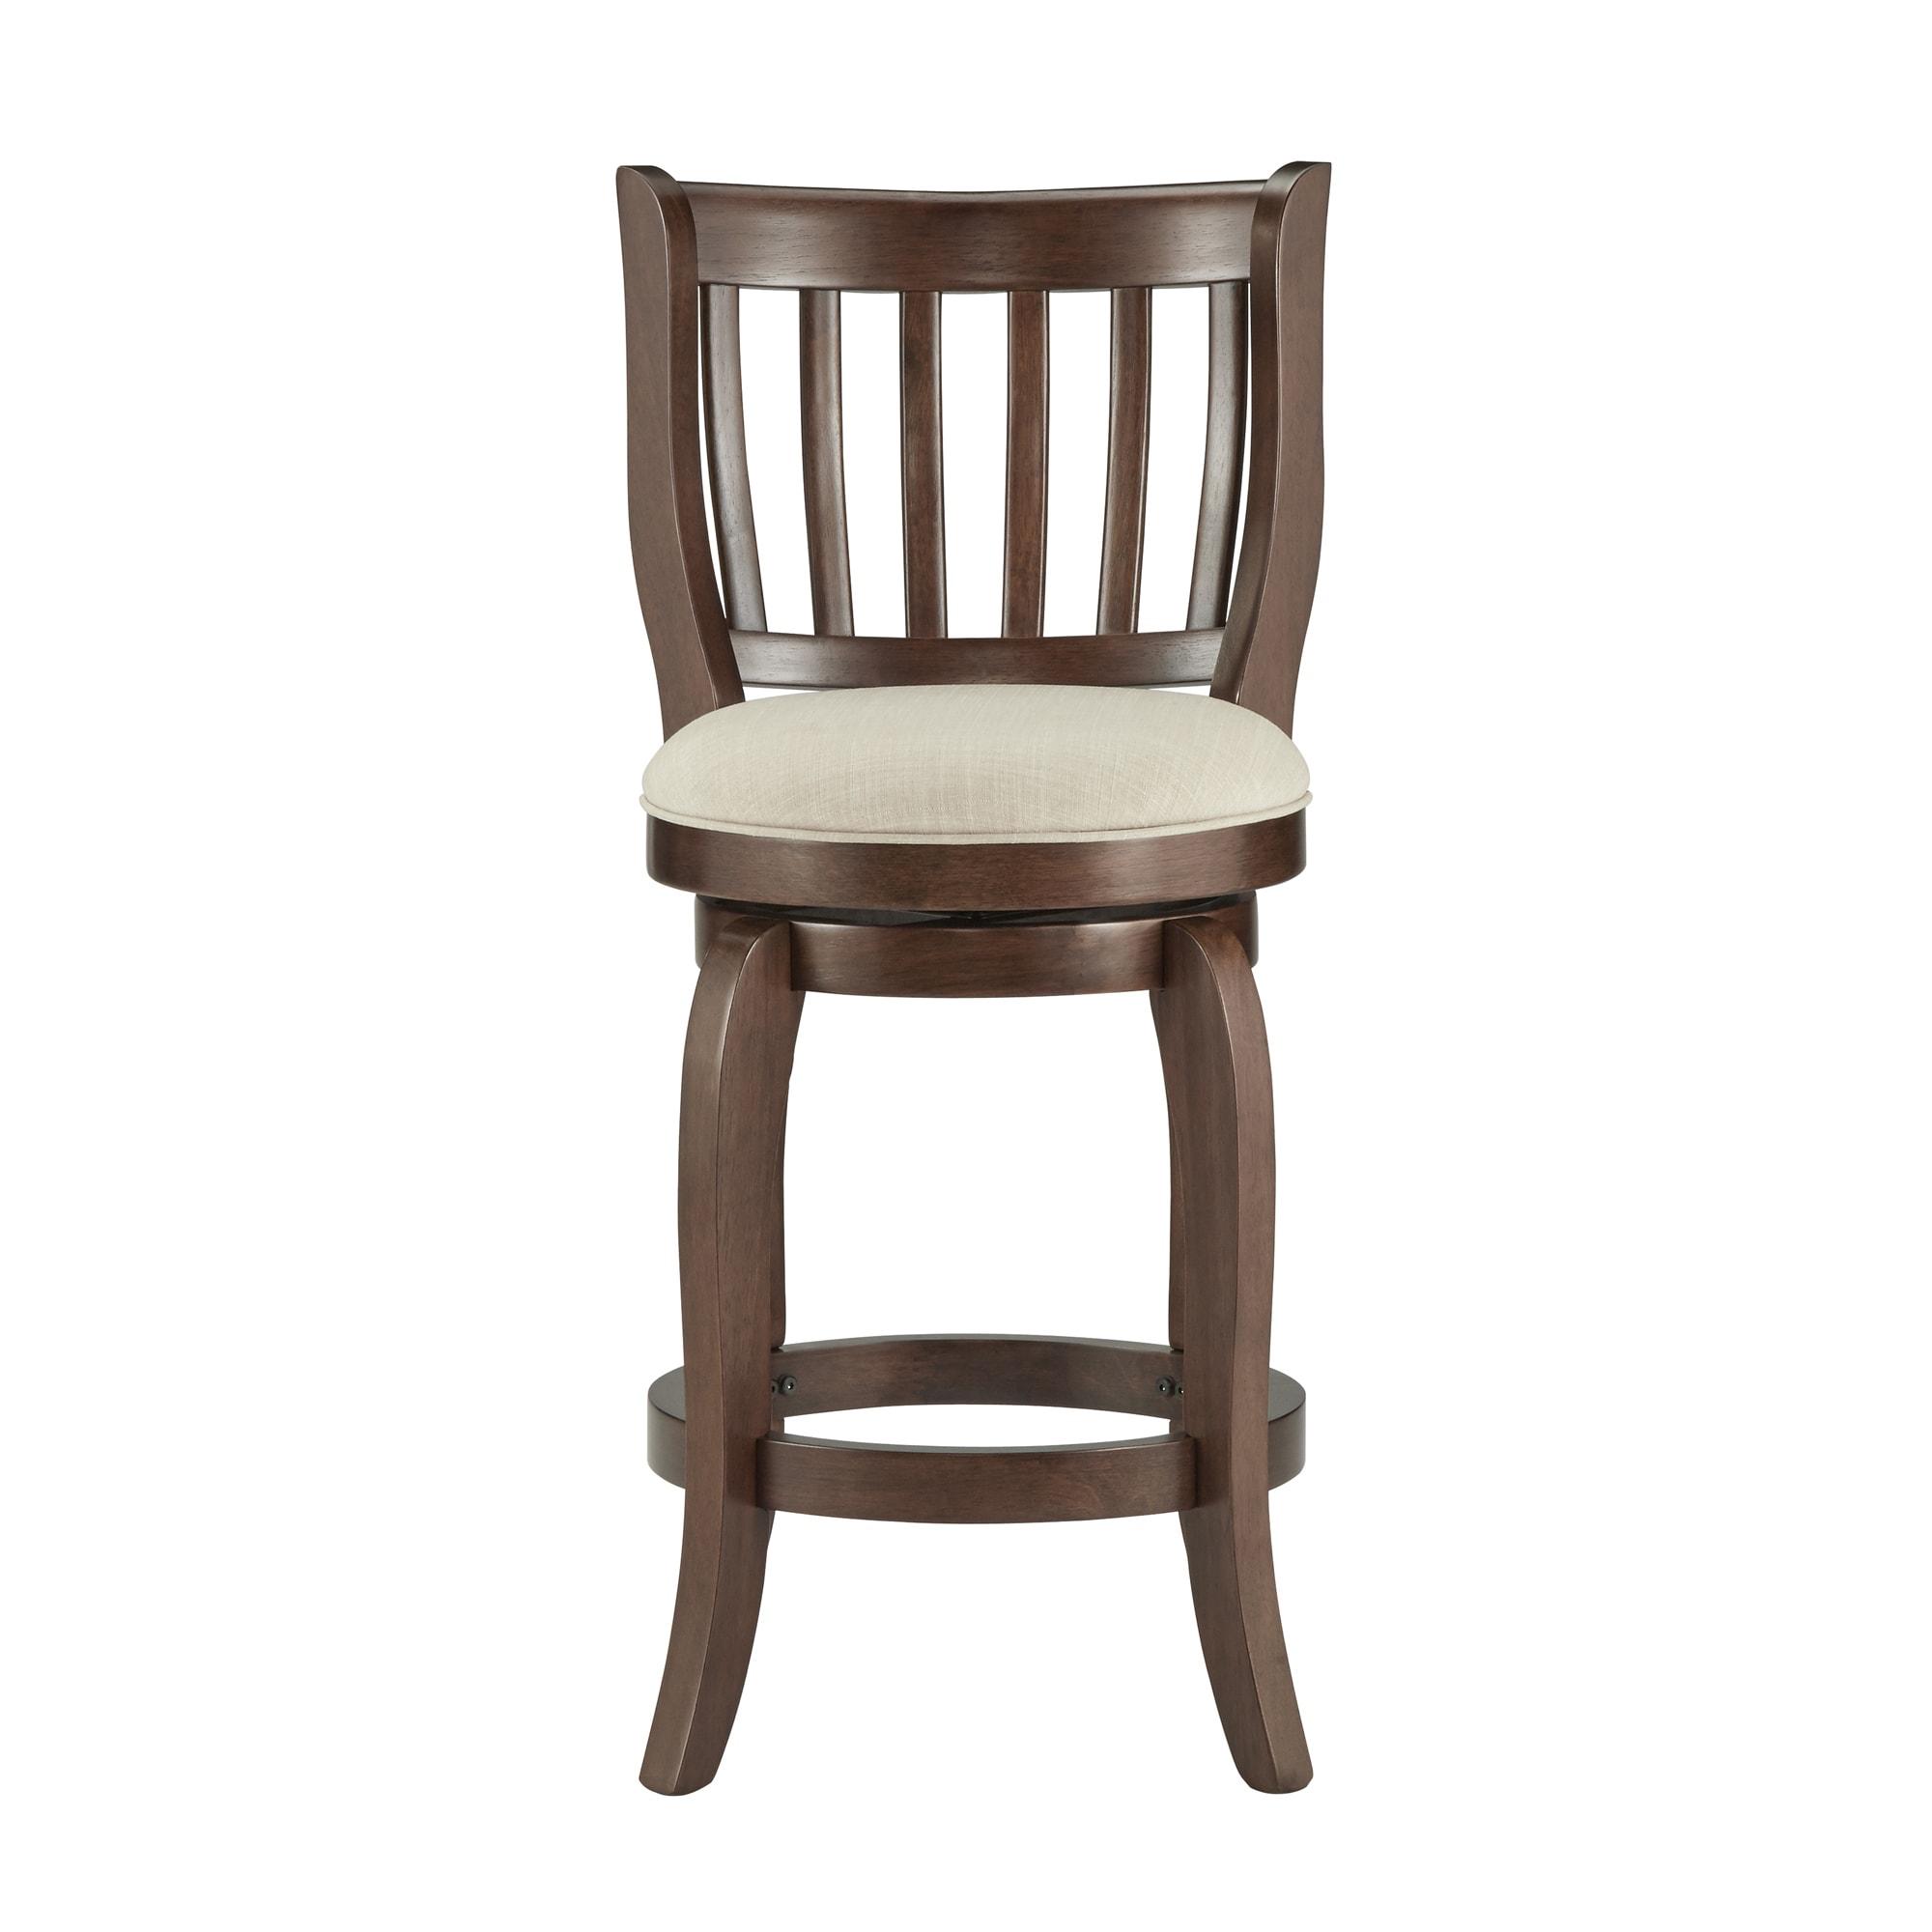 ali modern linen 24 inch high back counter height swivel stool by inspire q ebay. Black Bedroom Furniture Sets. Home Design Ideas